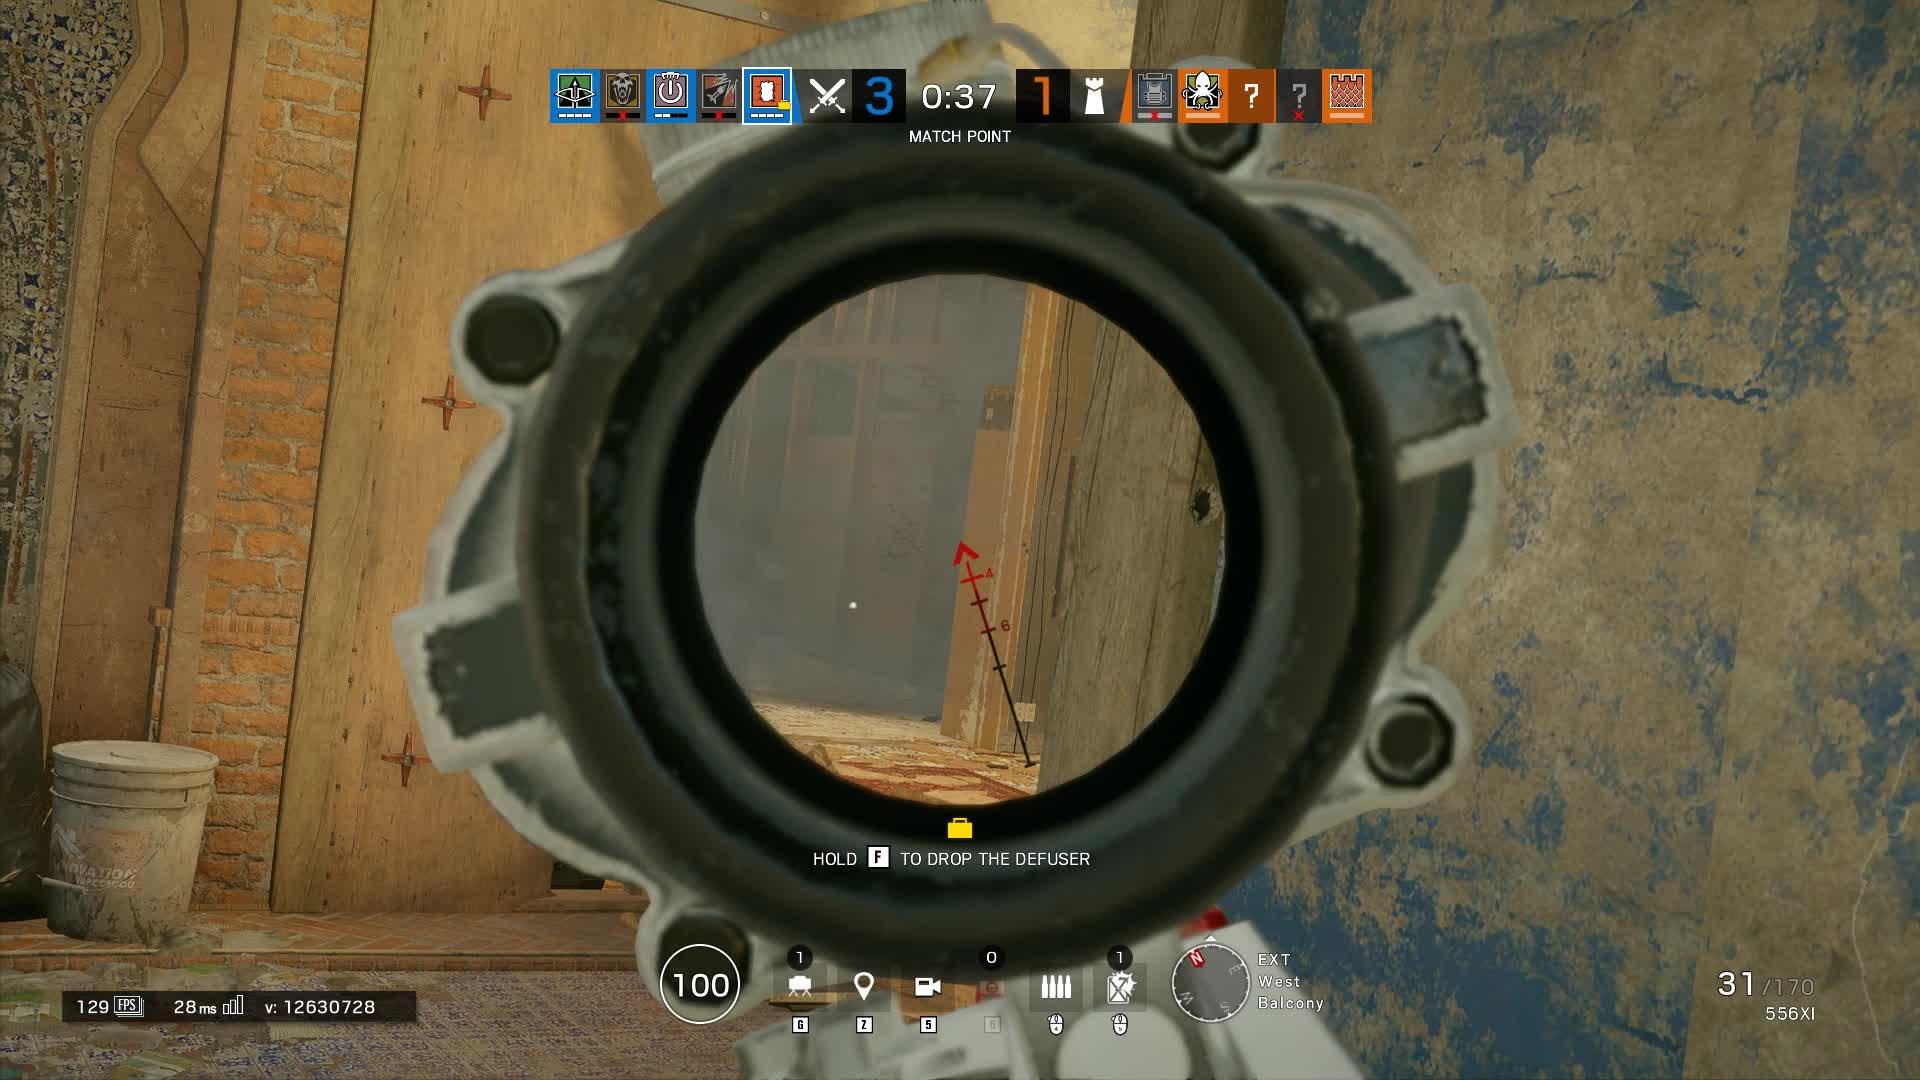 Siege bullshit GIFs